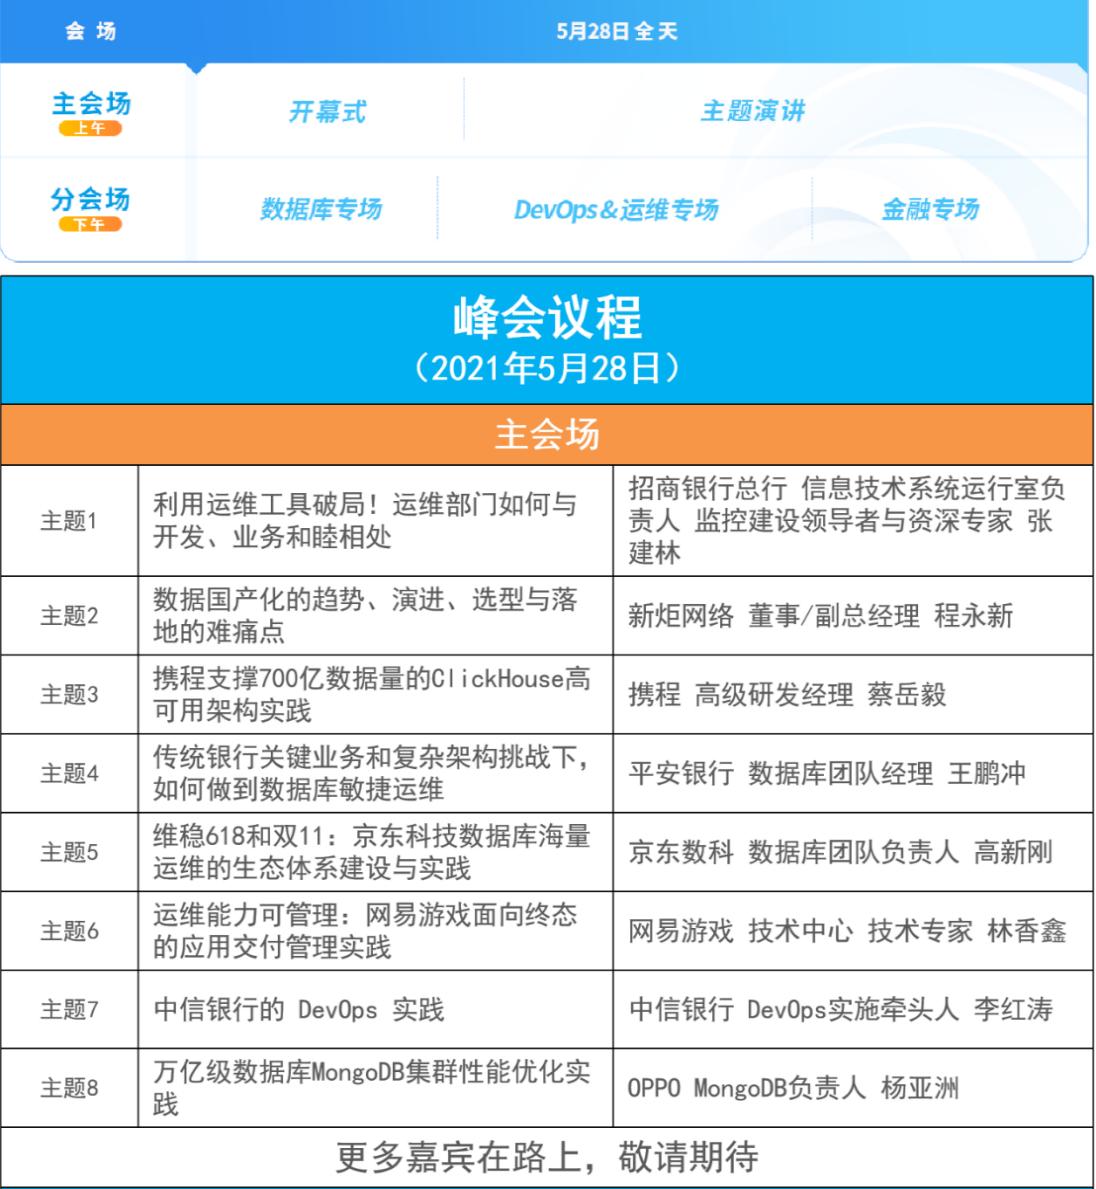 https://sslprod.oss-cn-shanghai.aliyuncs.com/stable/markdown_pic/20210324/8198/46152422/1616551936952.jpg